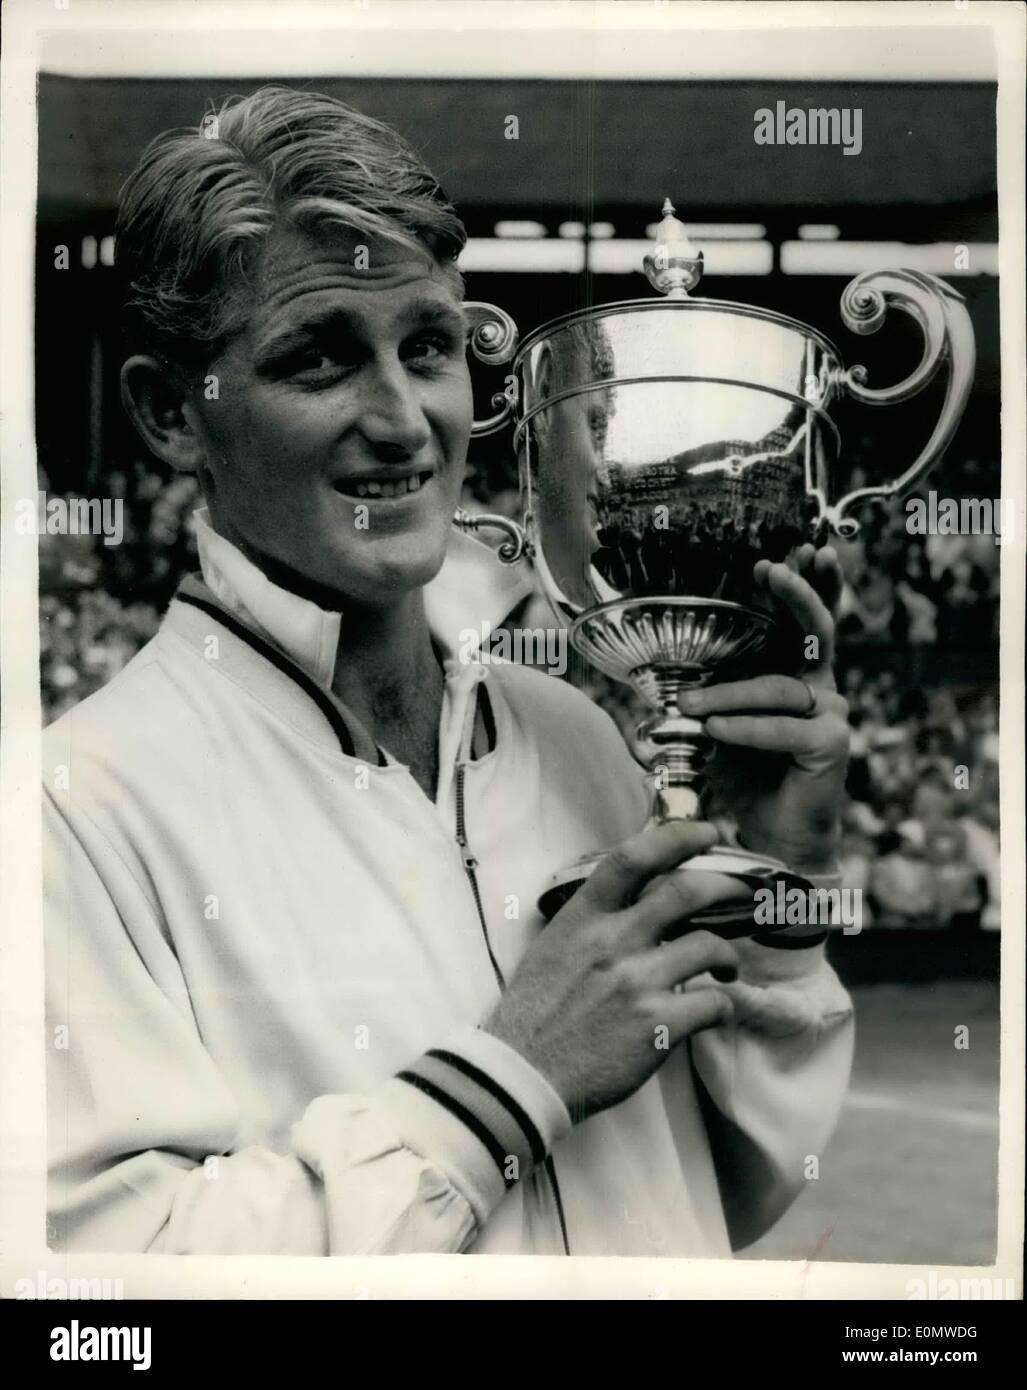 Jul 07 1956 Lew Hoad beats Ken Rosewall to win Men s Singles